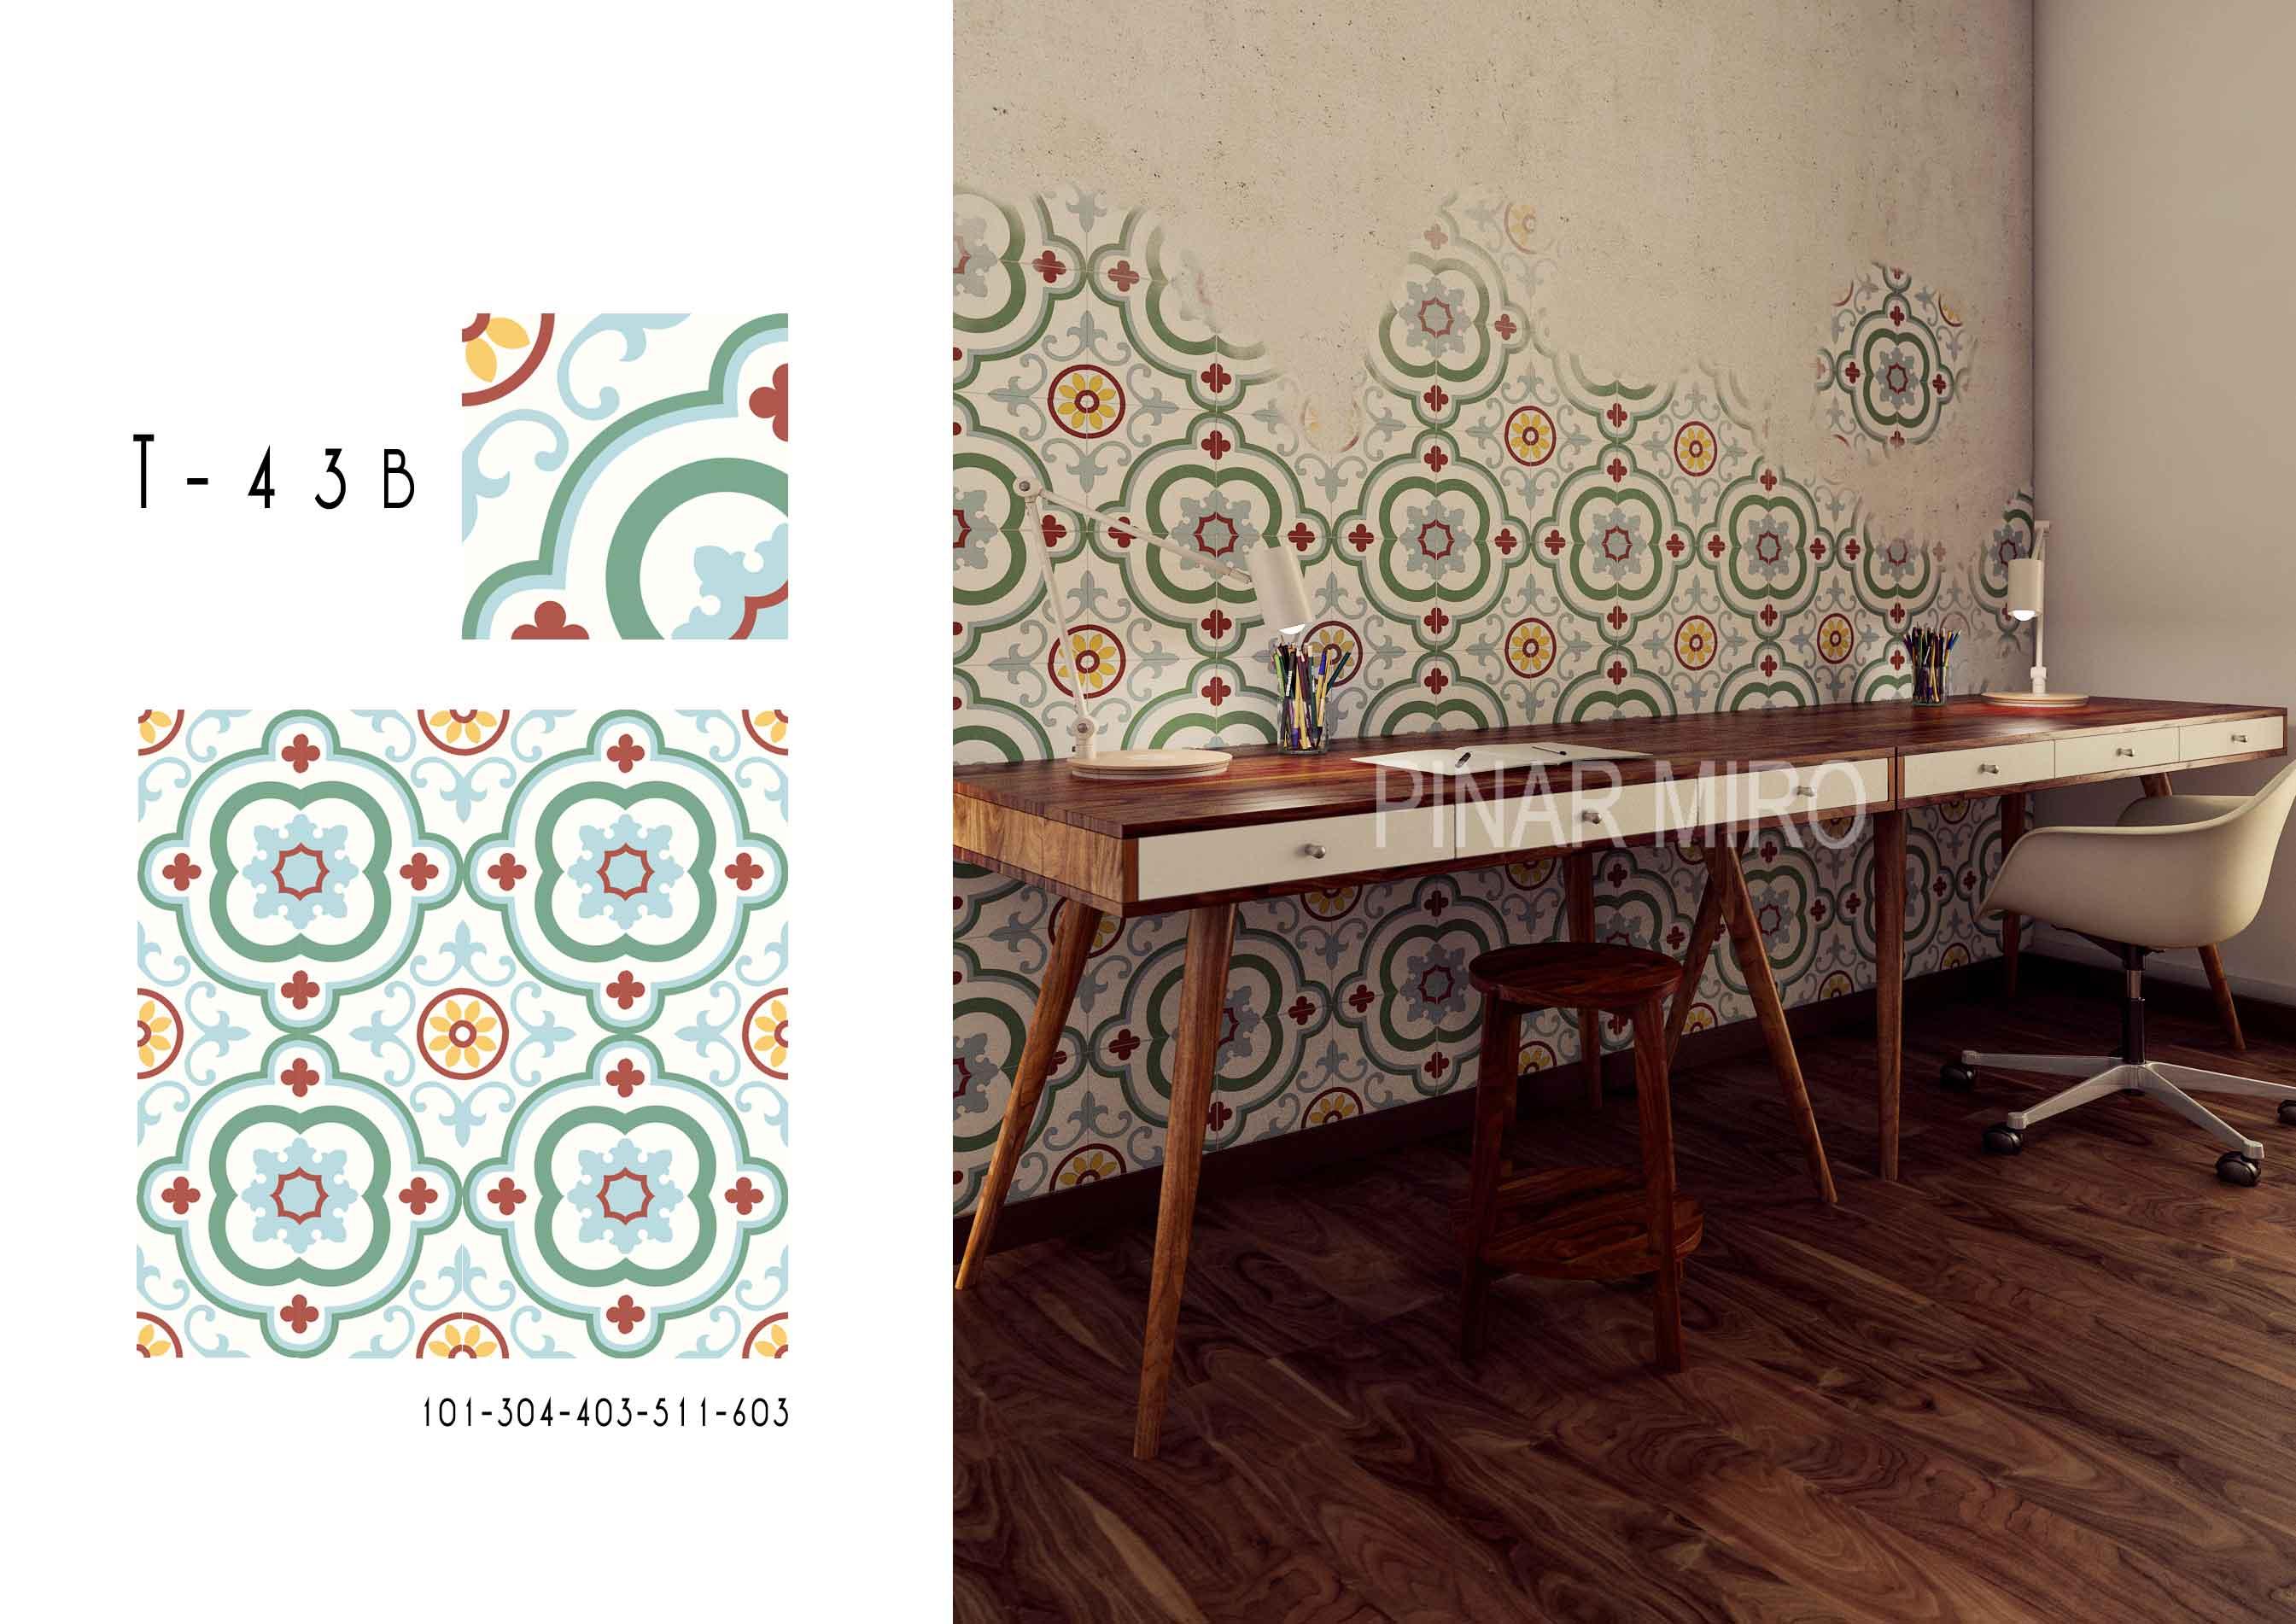 1t043b-pinar-miro-cement-tiles